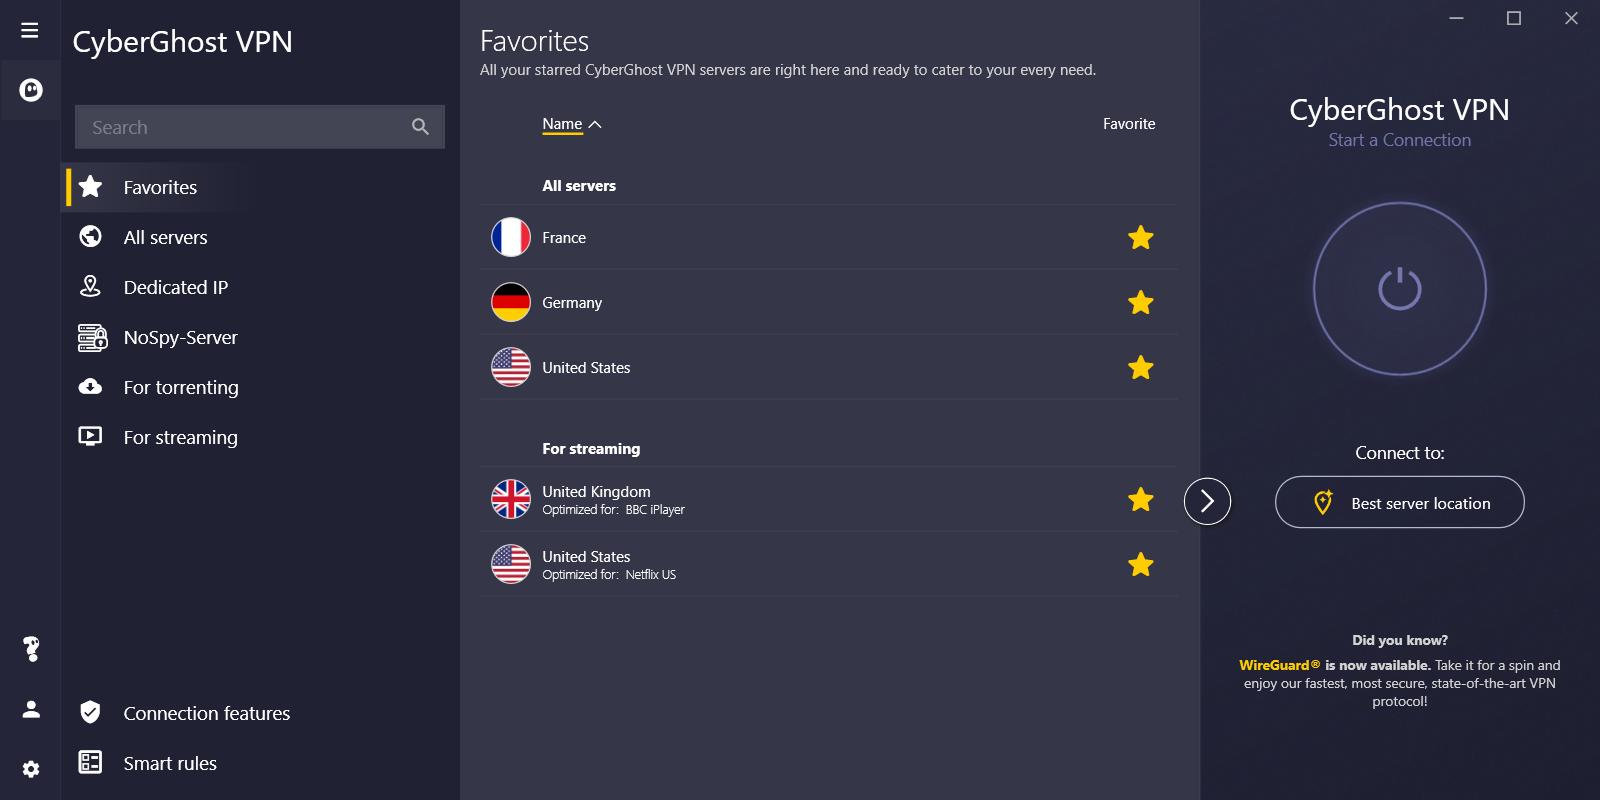 Cyberghost screenshot showing list of favorite servers